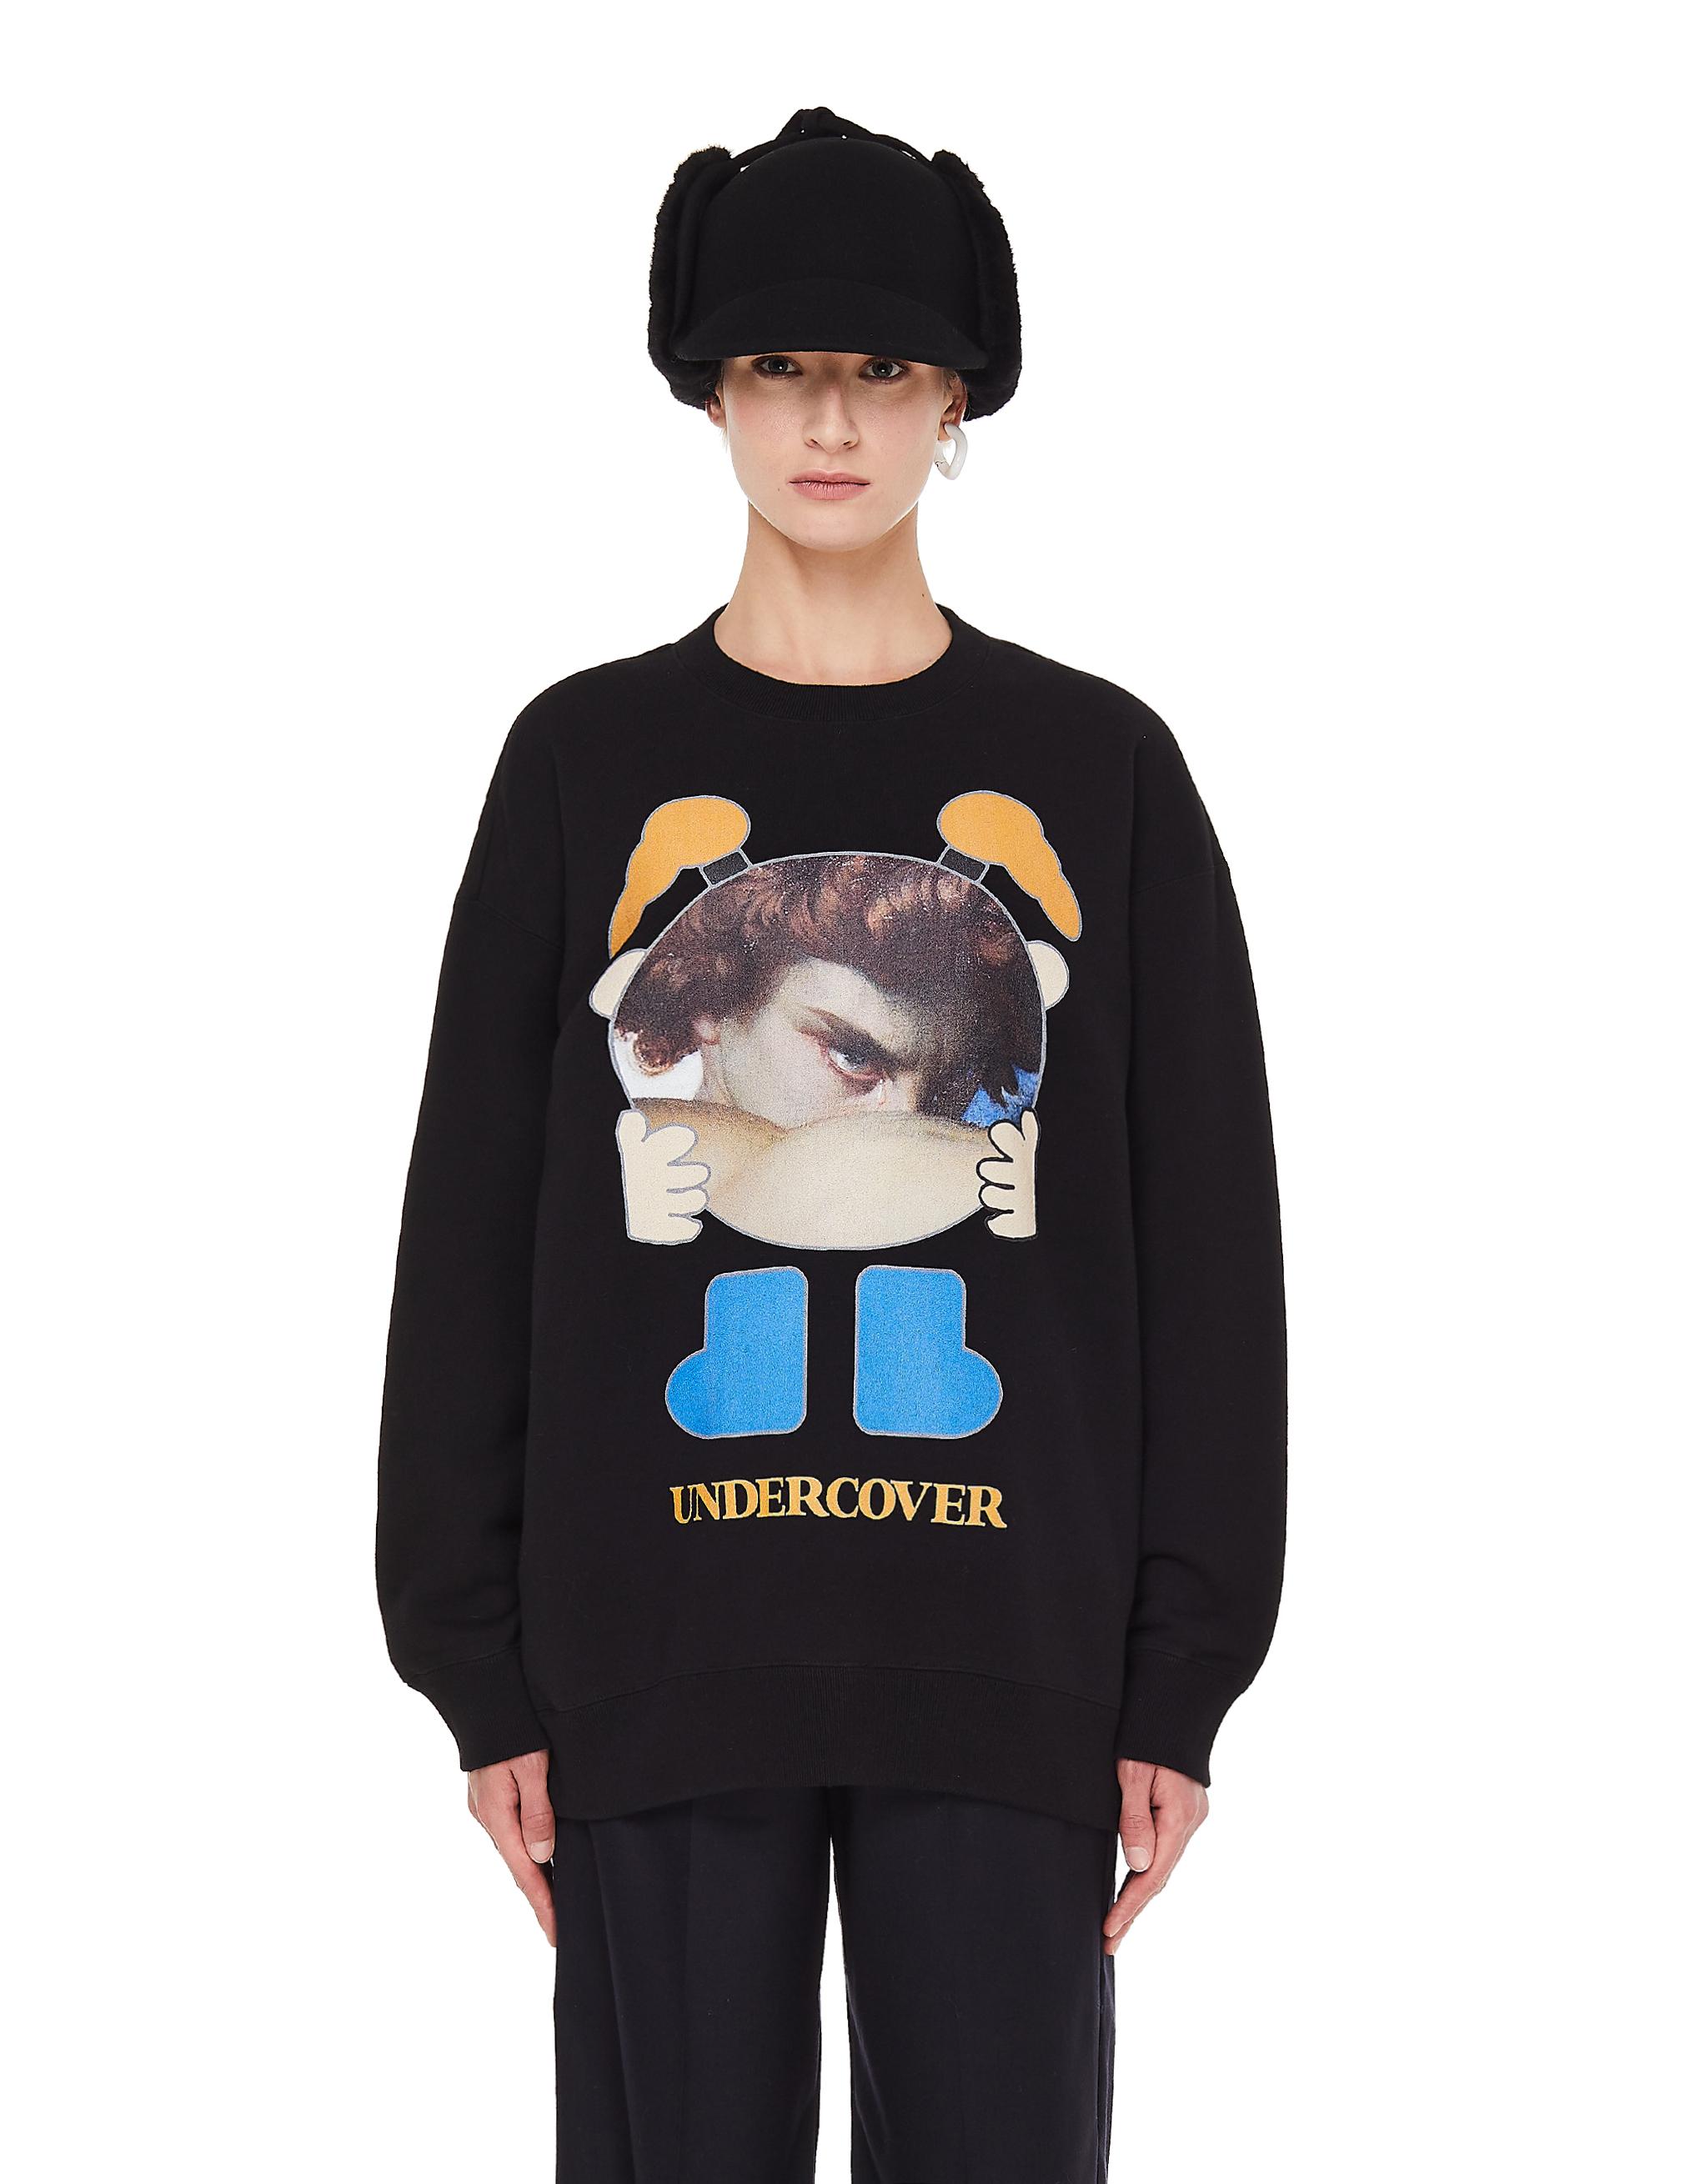 Undercover Black Cotton Printed Sweatshirt